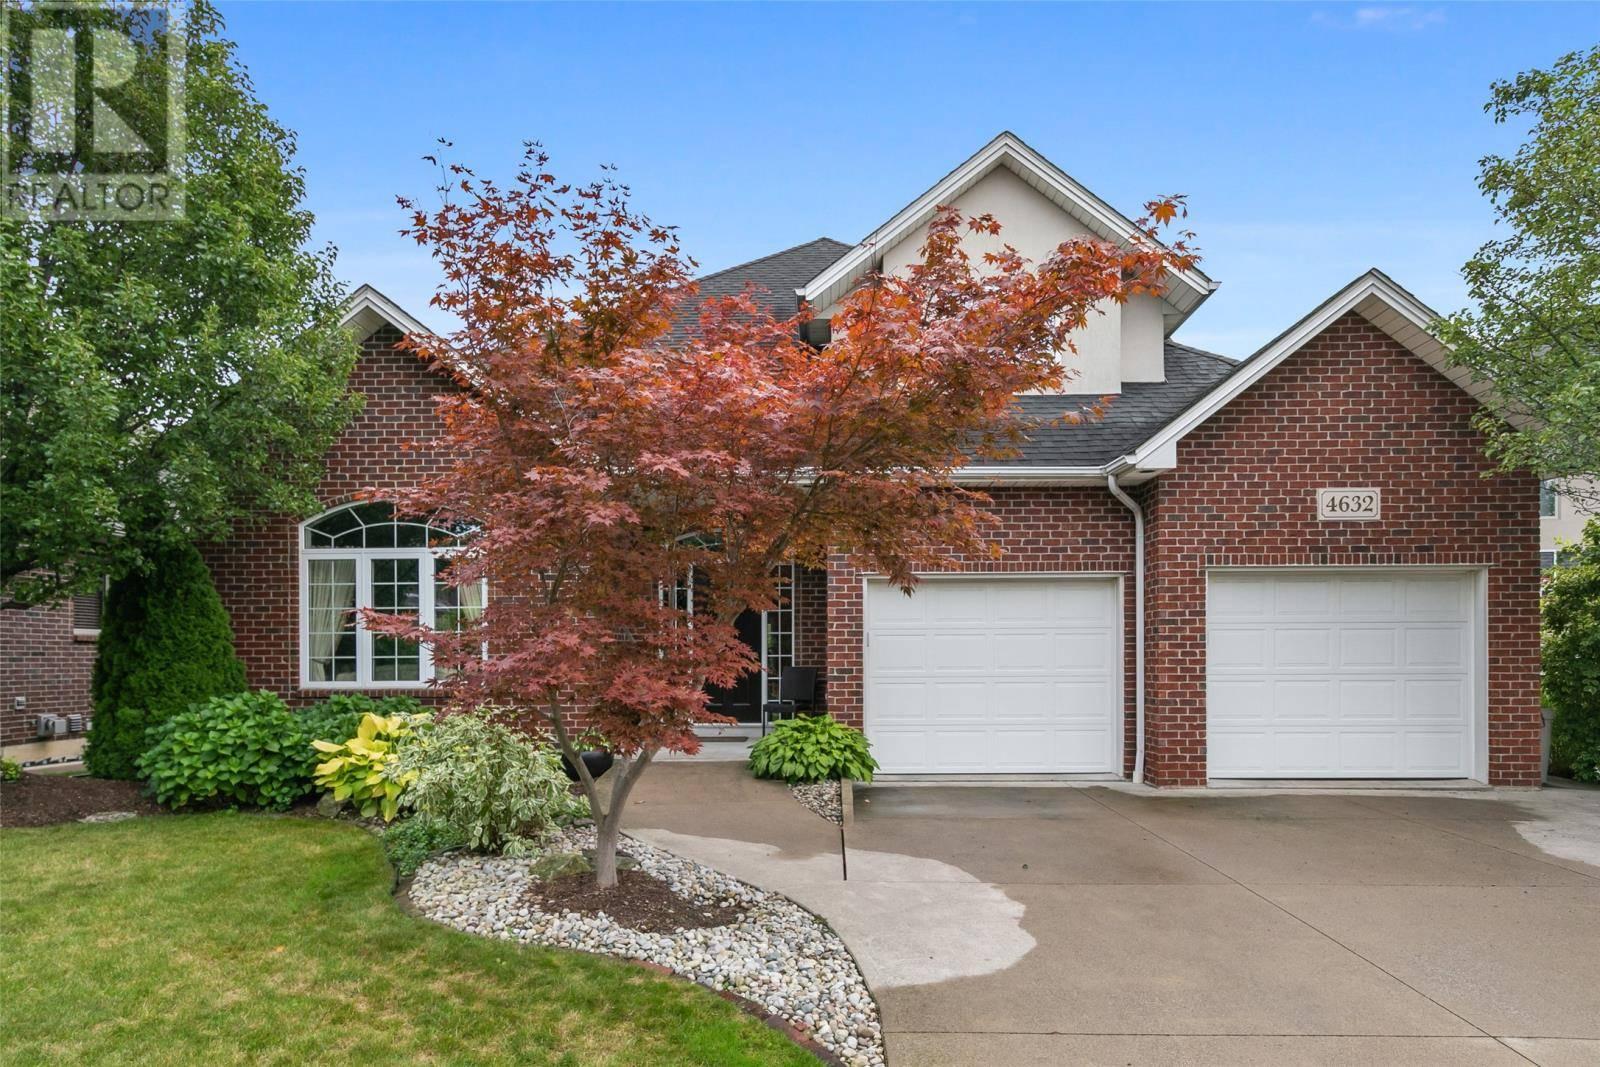 House for sale at 4632 Jenkela Ct Windsor Ontario - MLS: 19025550